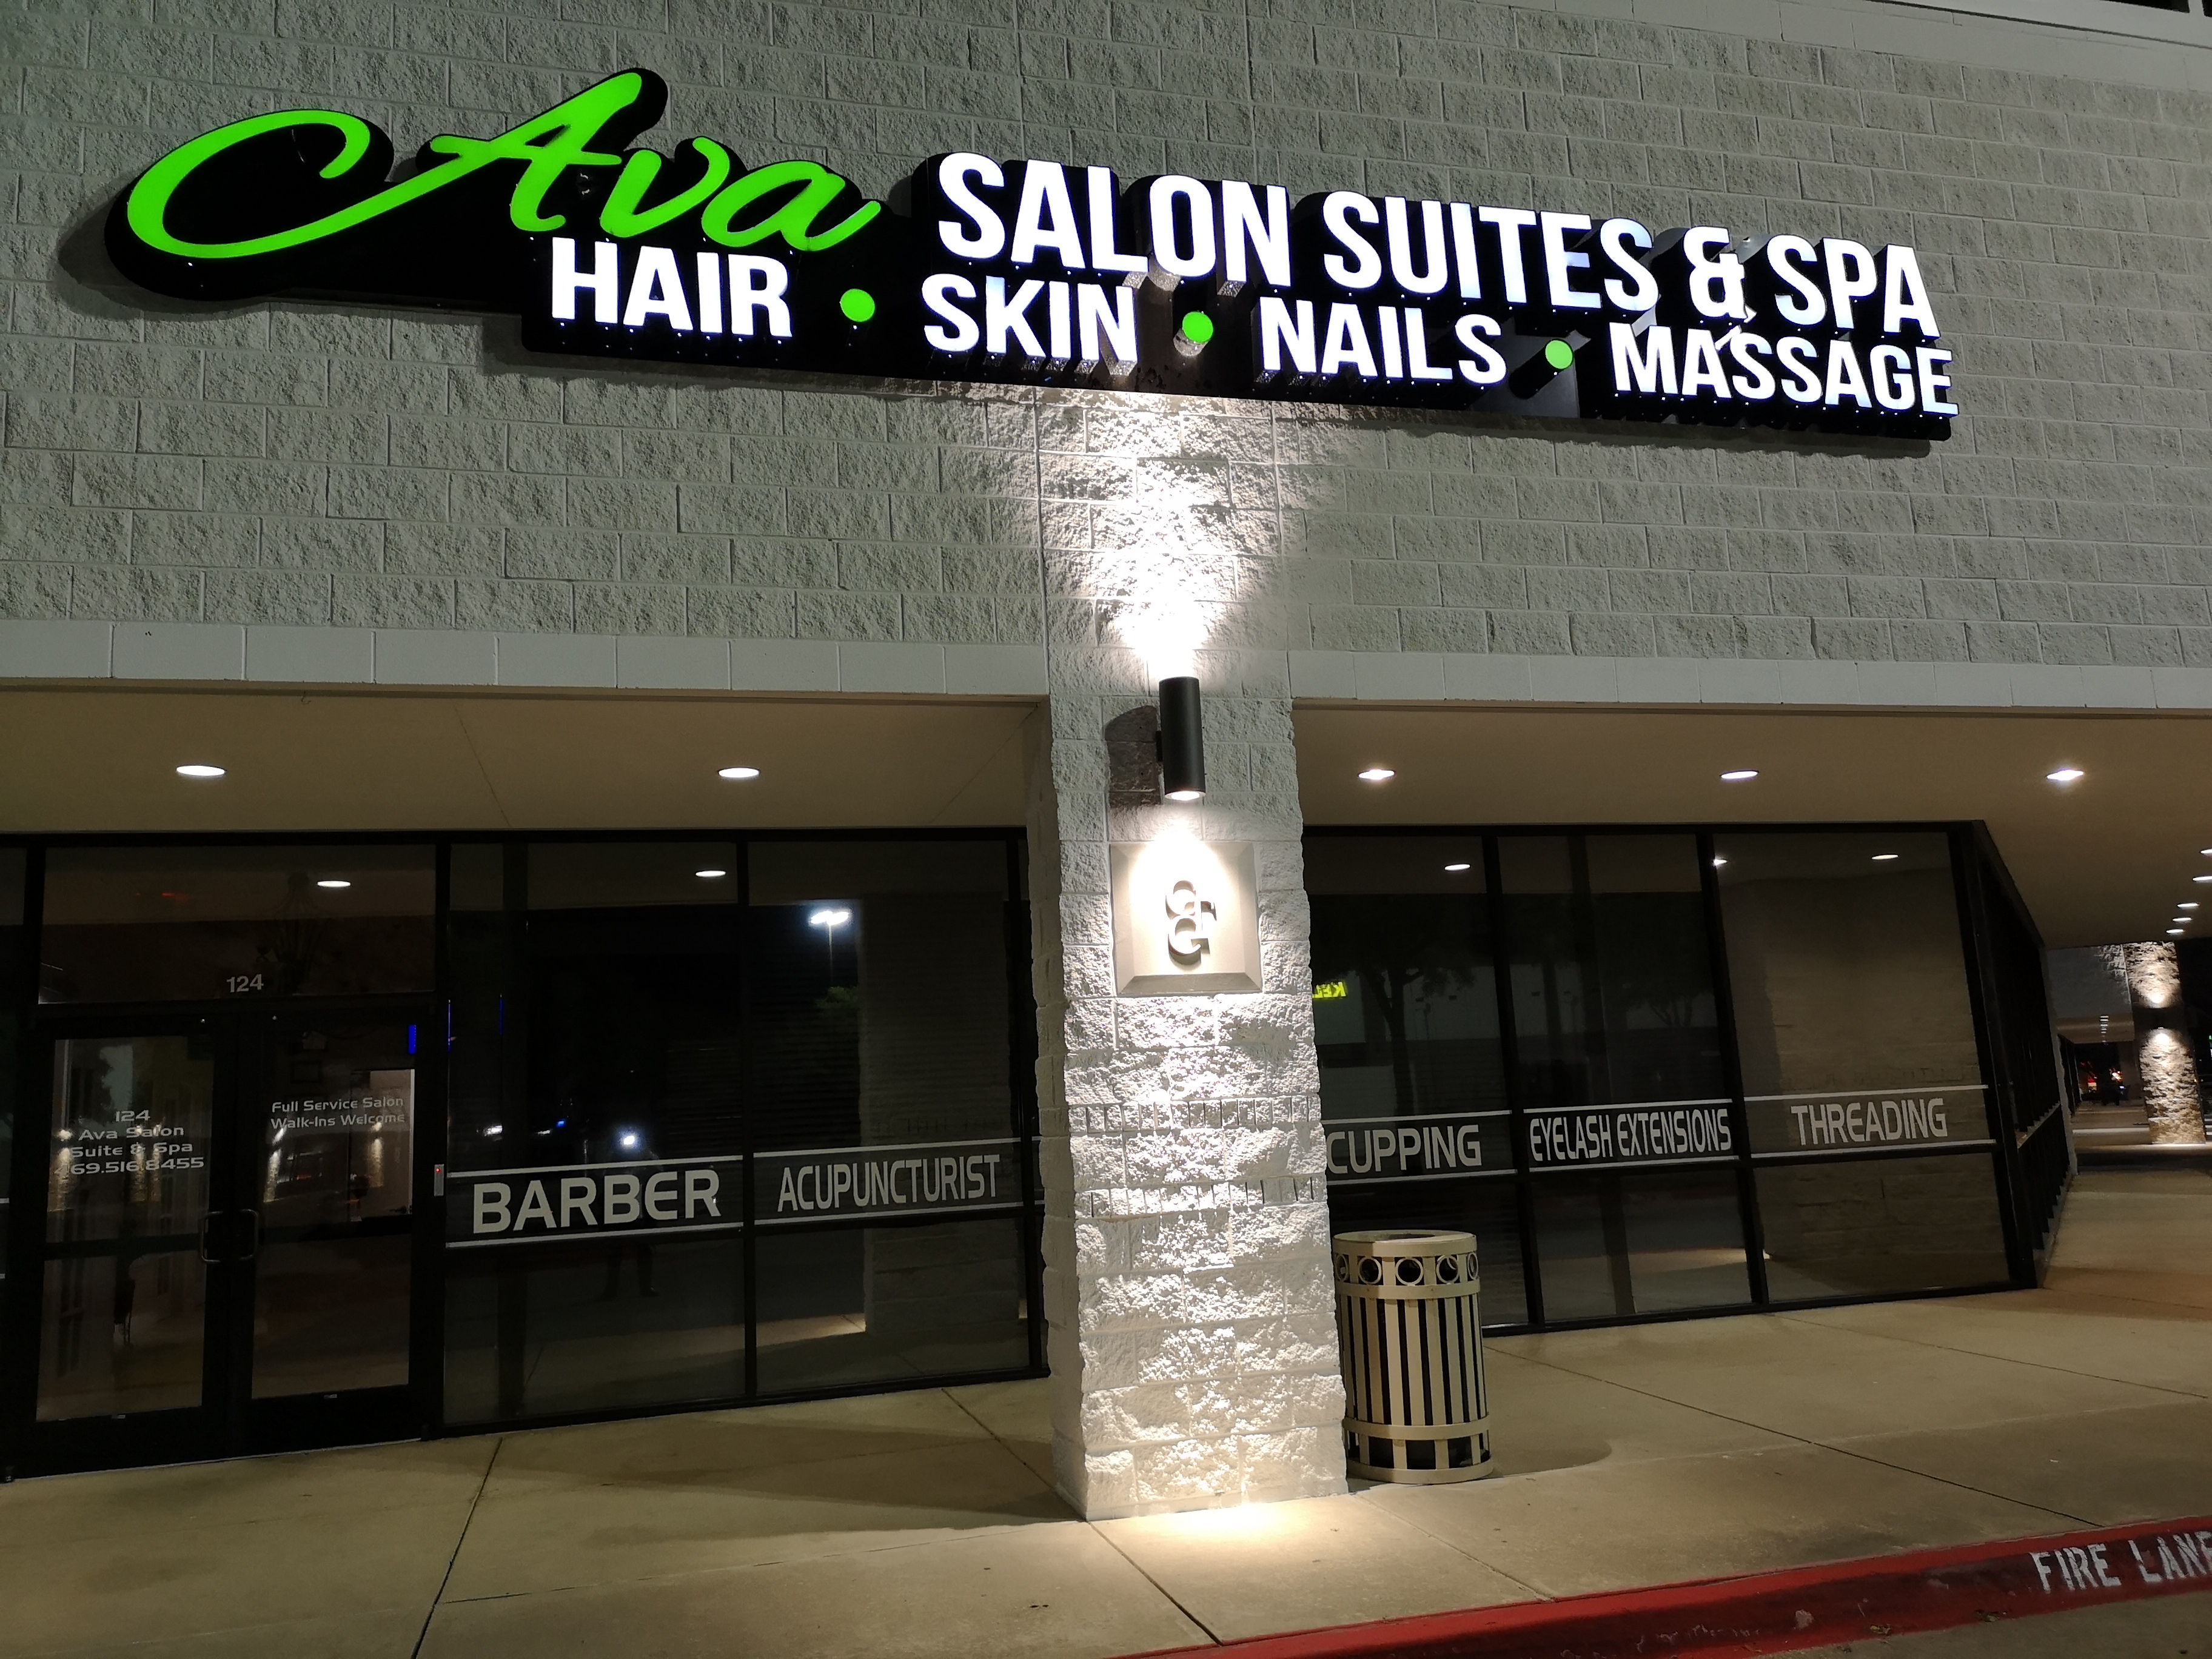 Ava Salon Suites & Spa